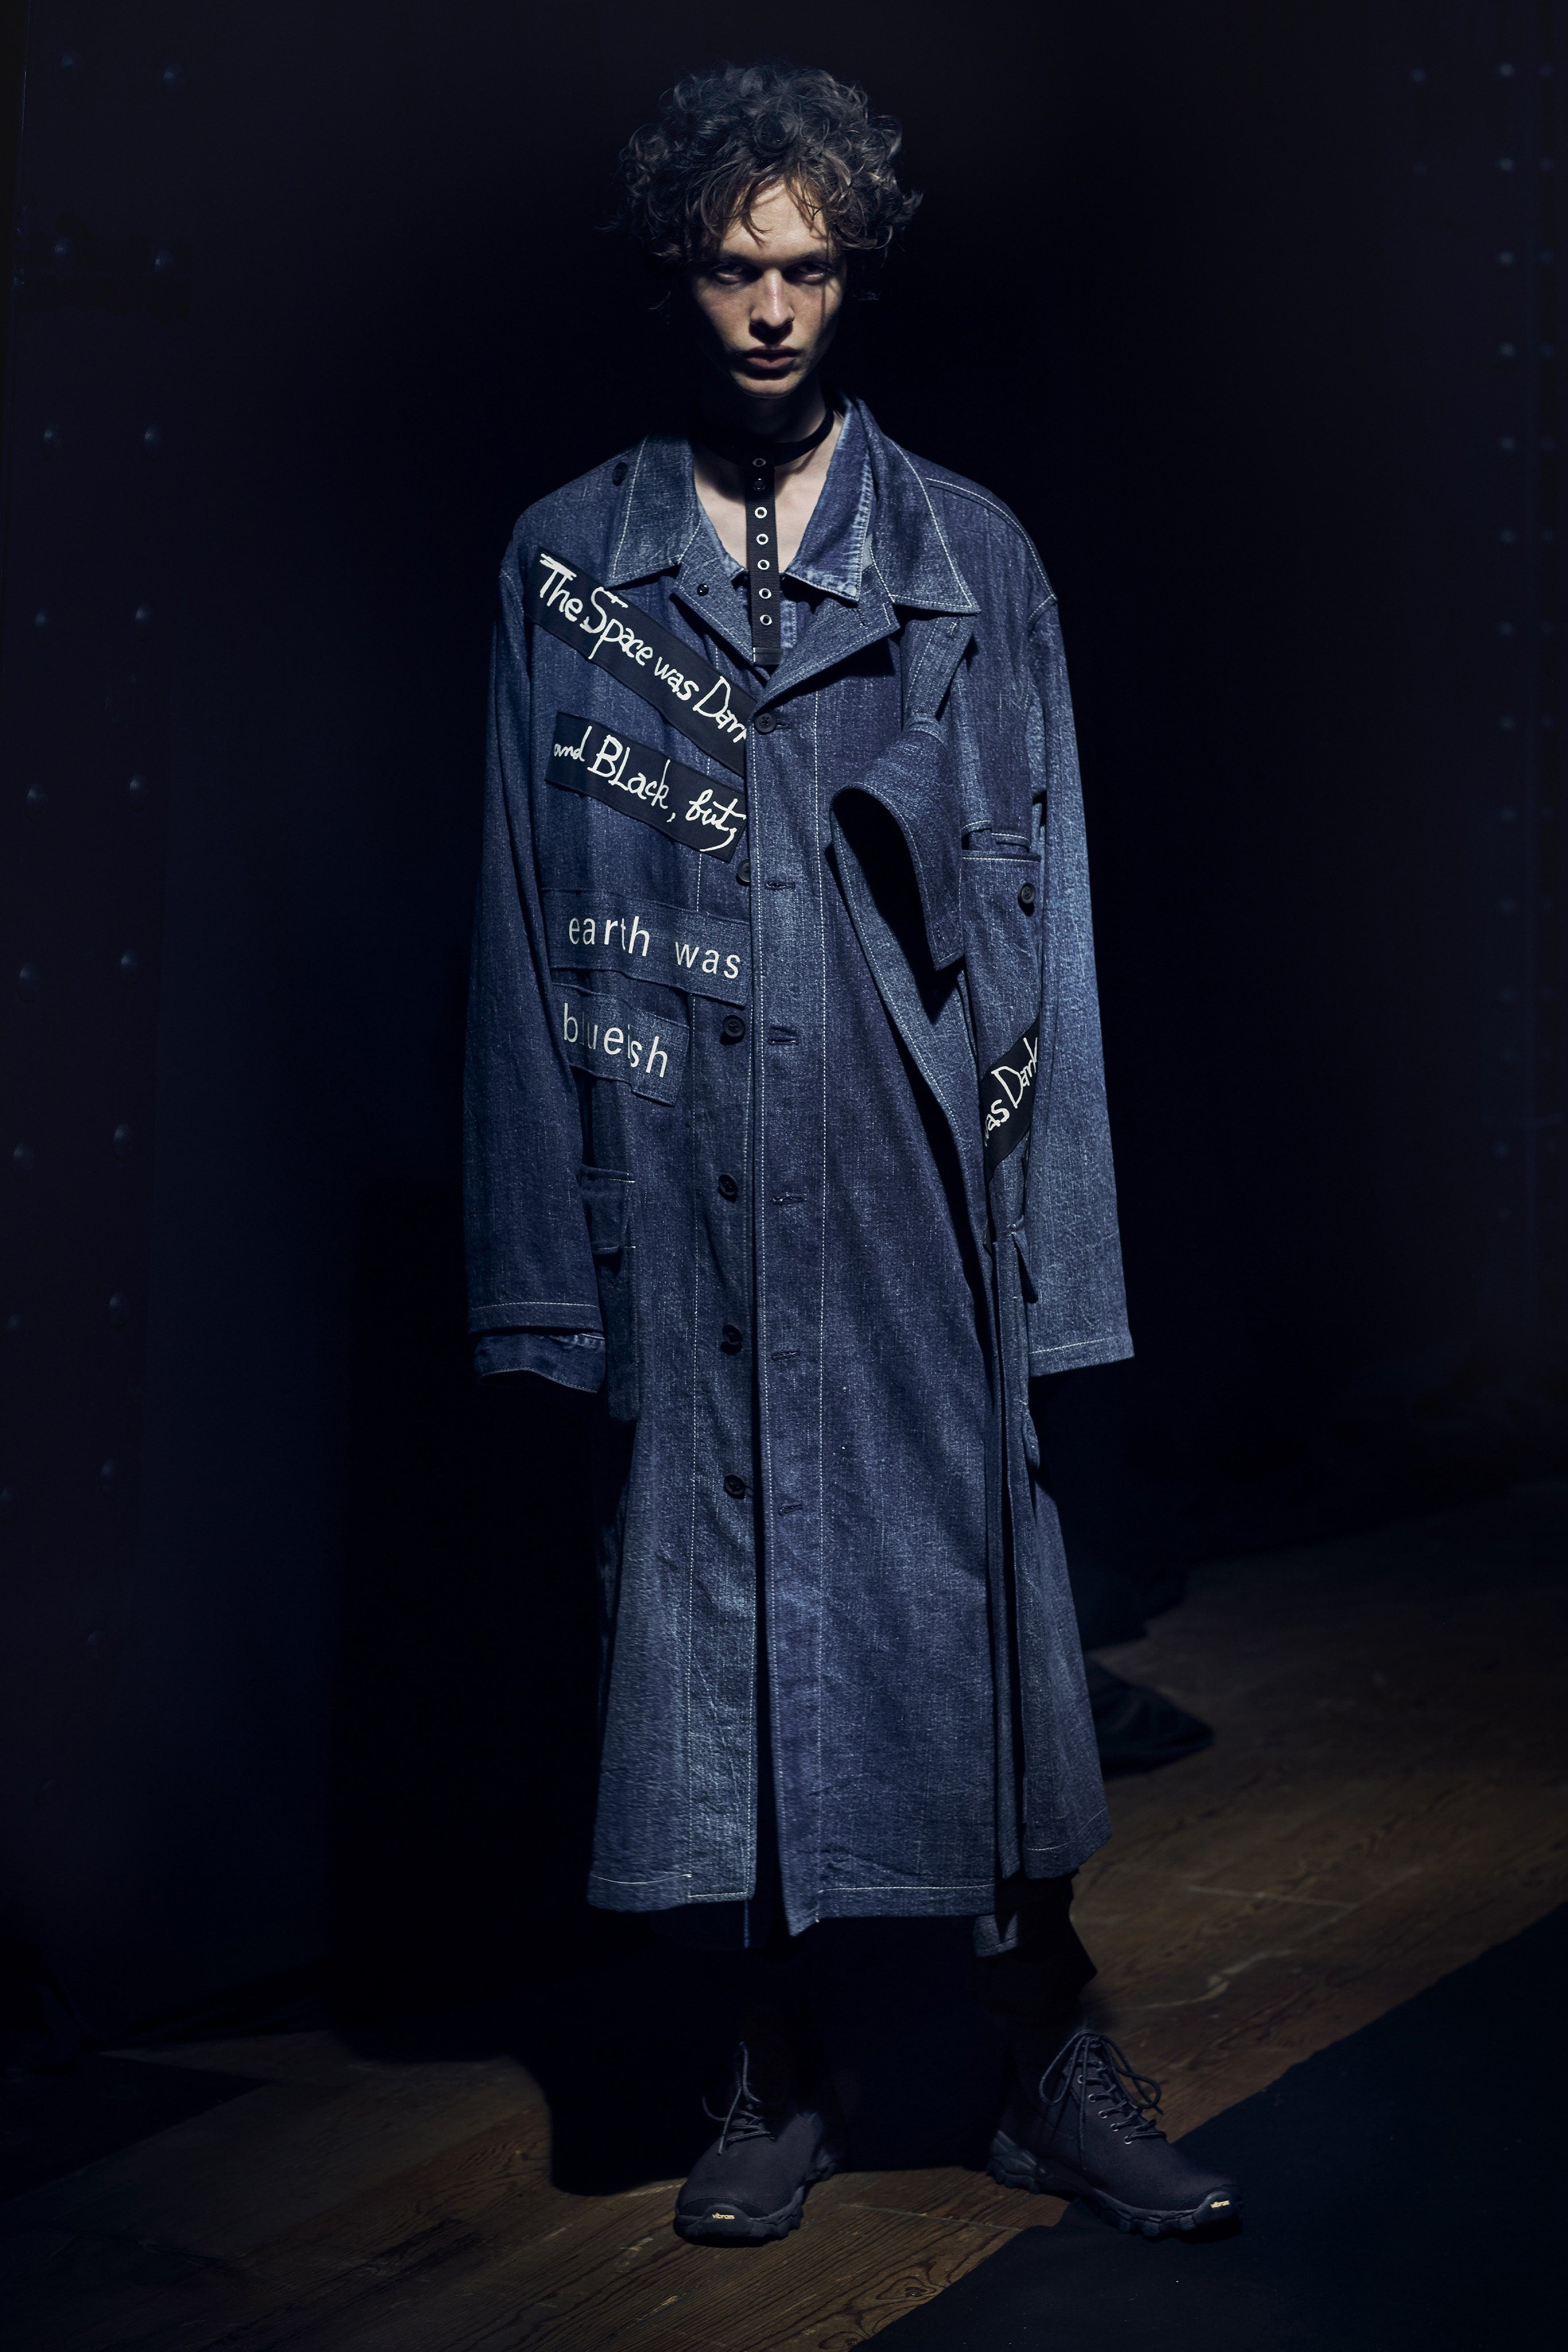 Yohji Yamamoto Spring-Summer 2021 Autor: Takay / Courtesy of Yohji Yamamoto